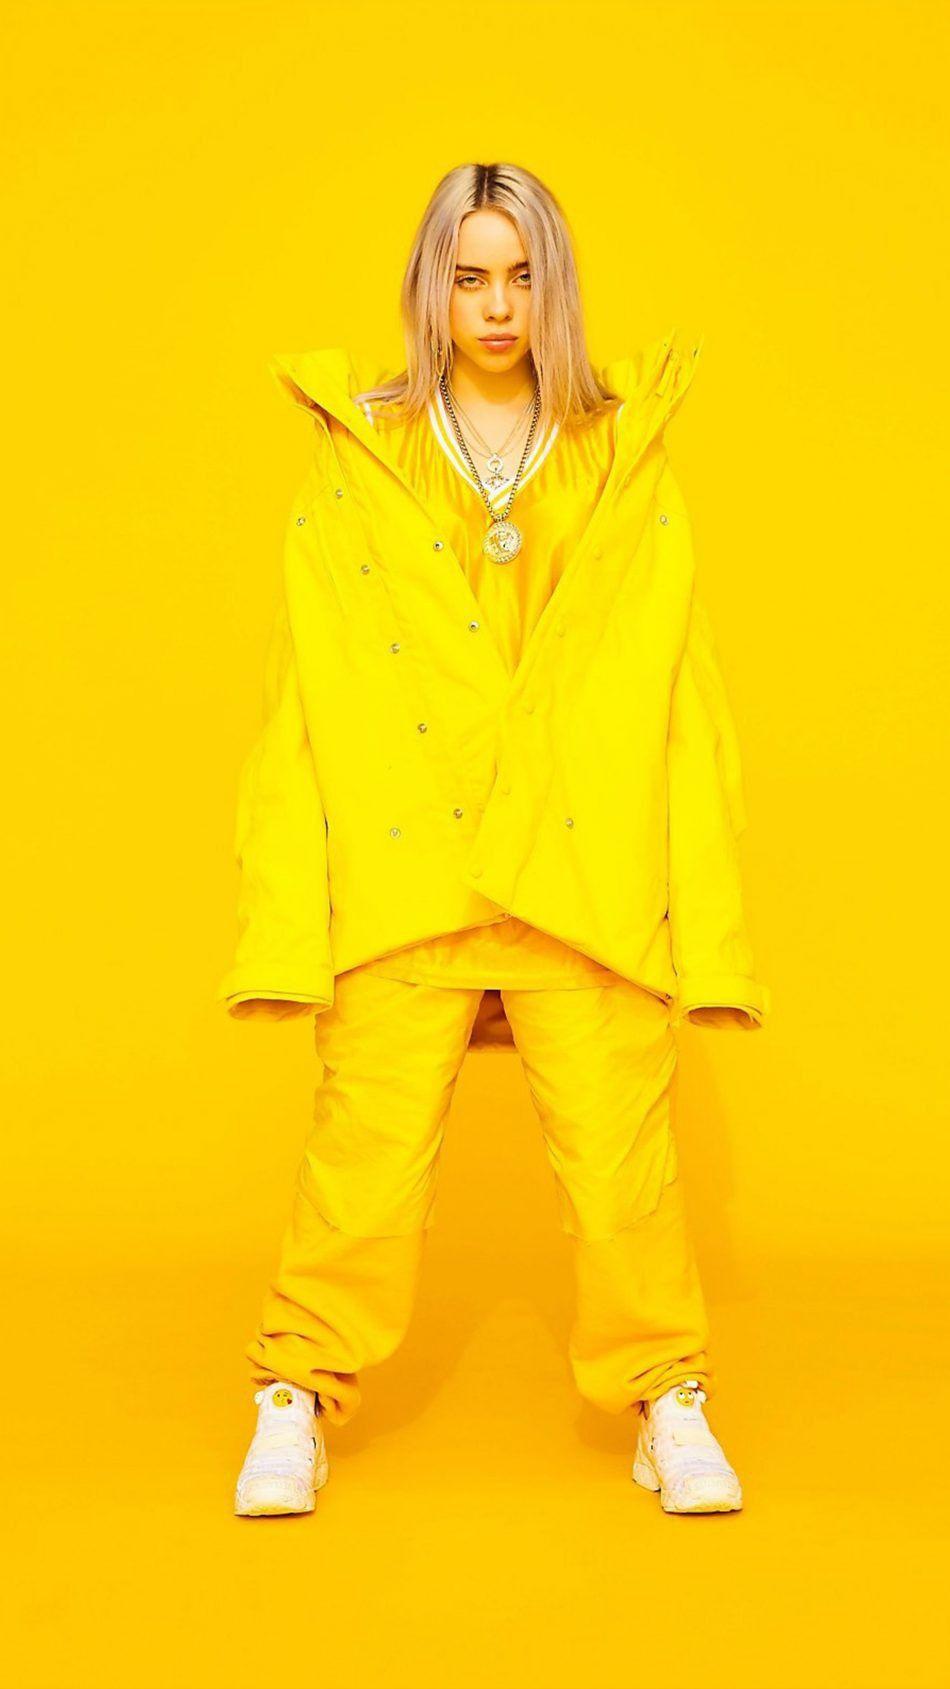 Billie Di 2020 Selebriti Gaya Model Pakaian Kuning